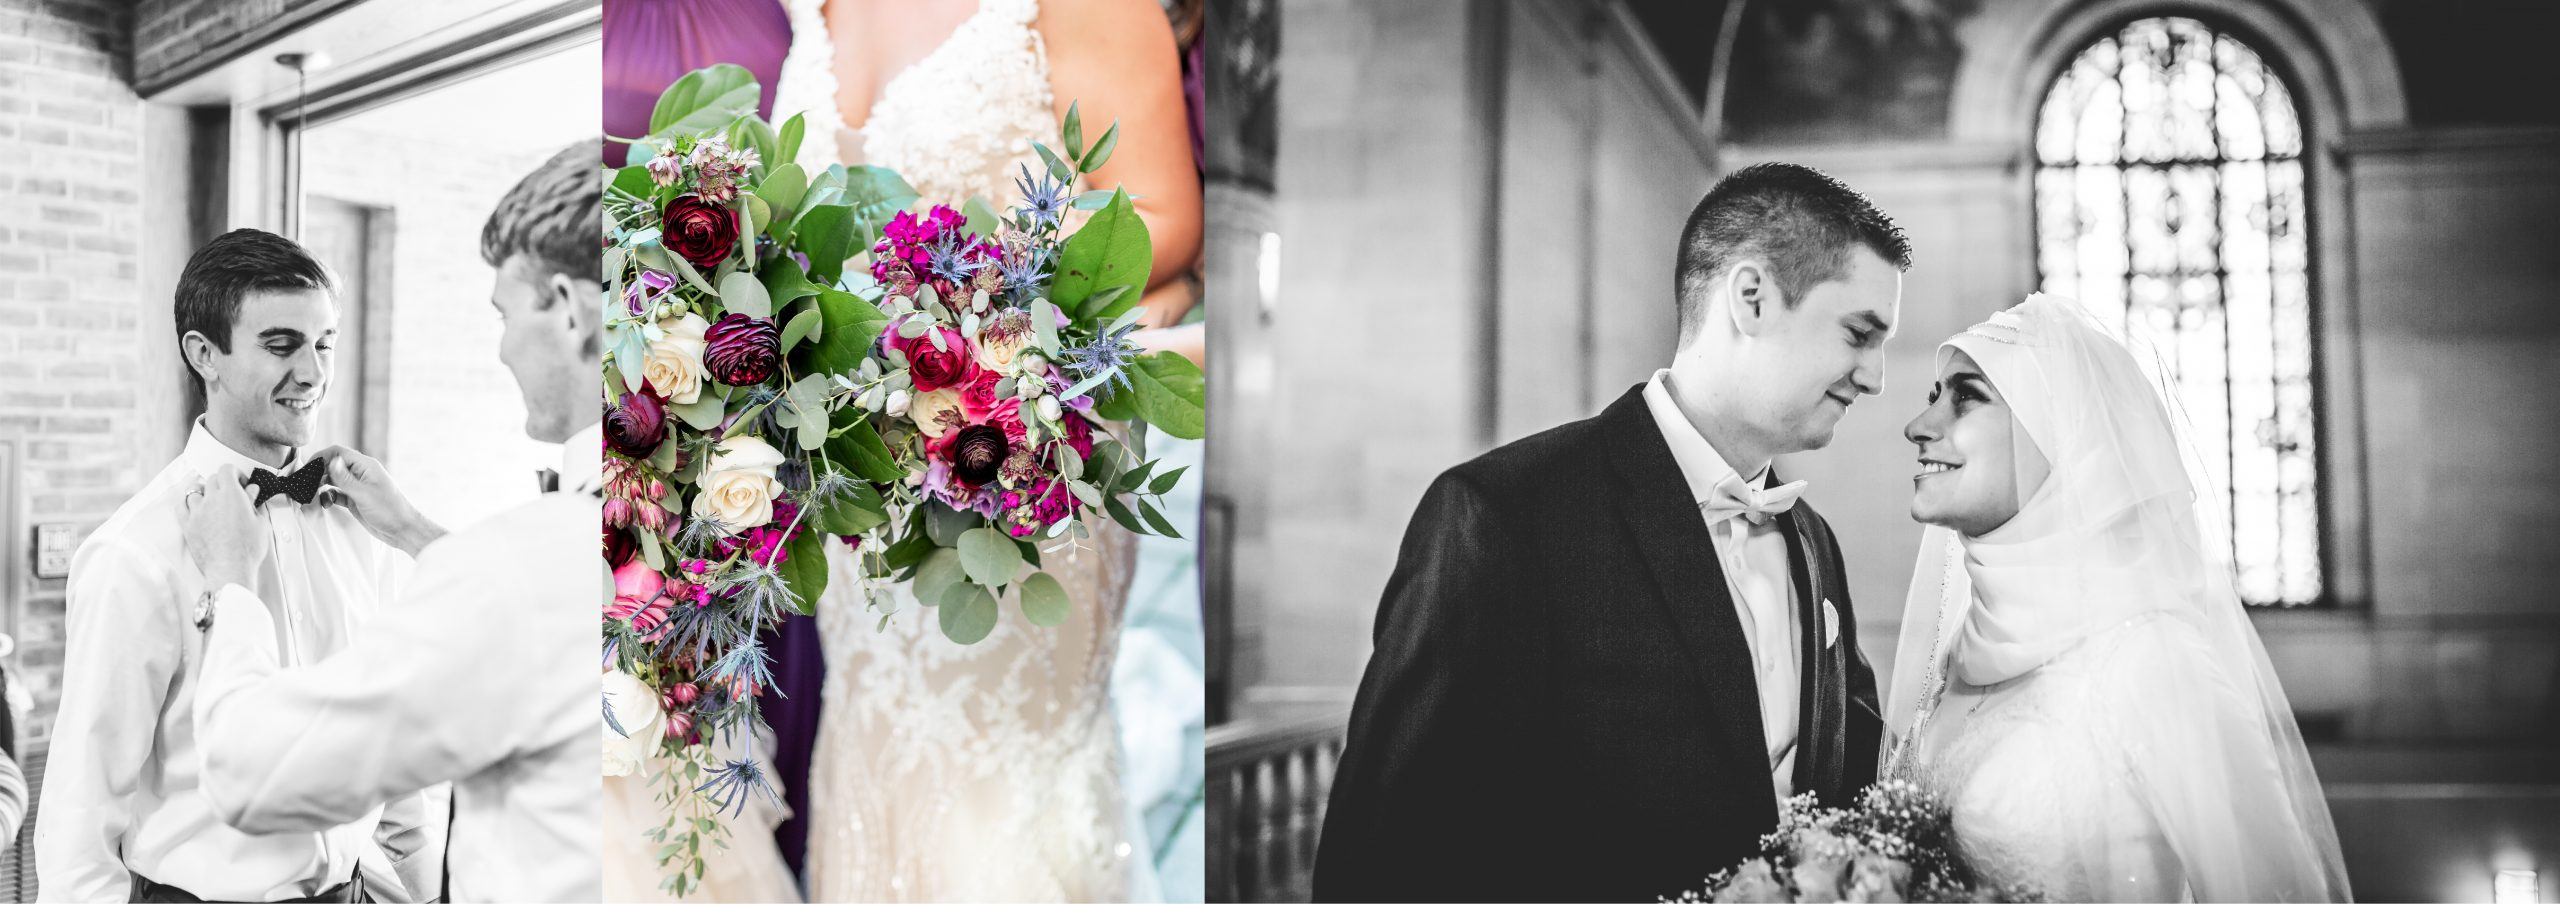 kandra-lynn-photography-michigan-wedding-photographer-04